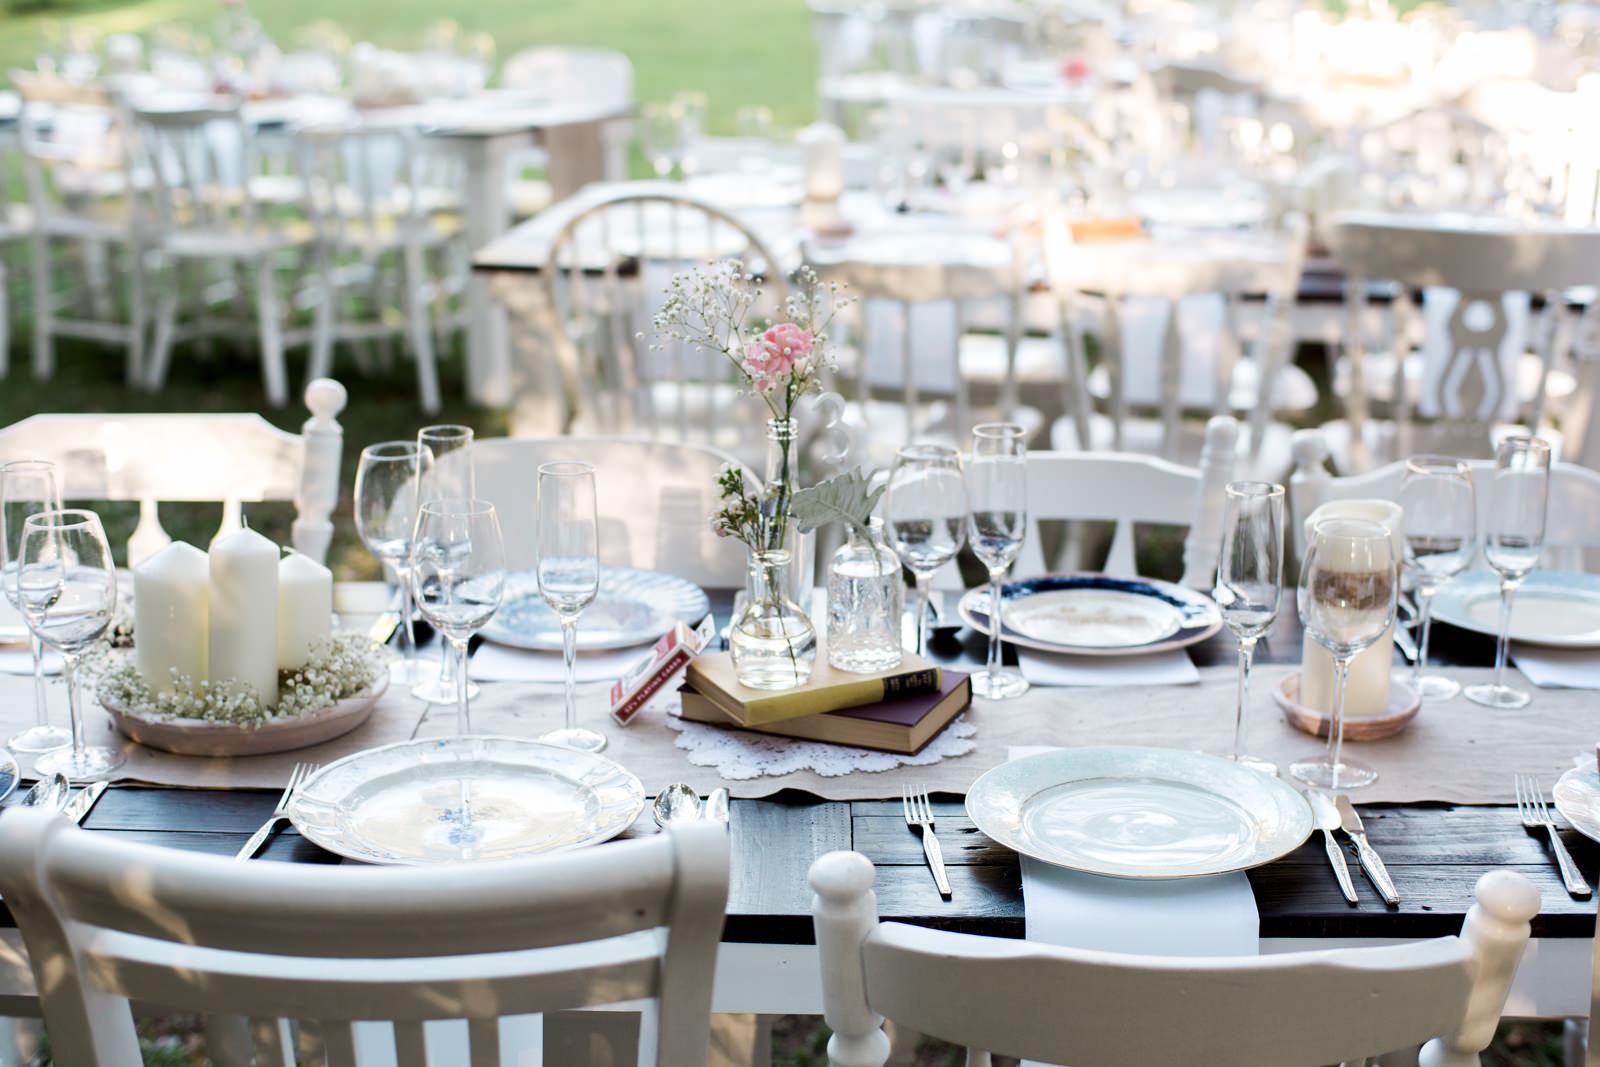 Vintage wedding reception table setting